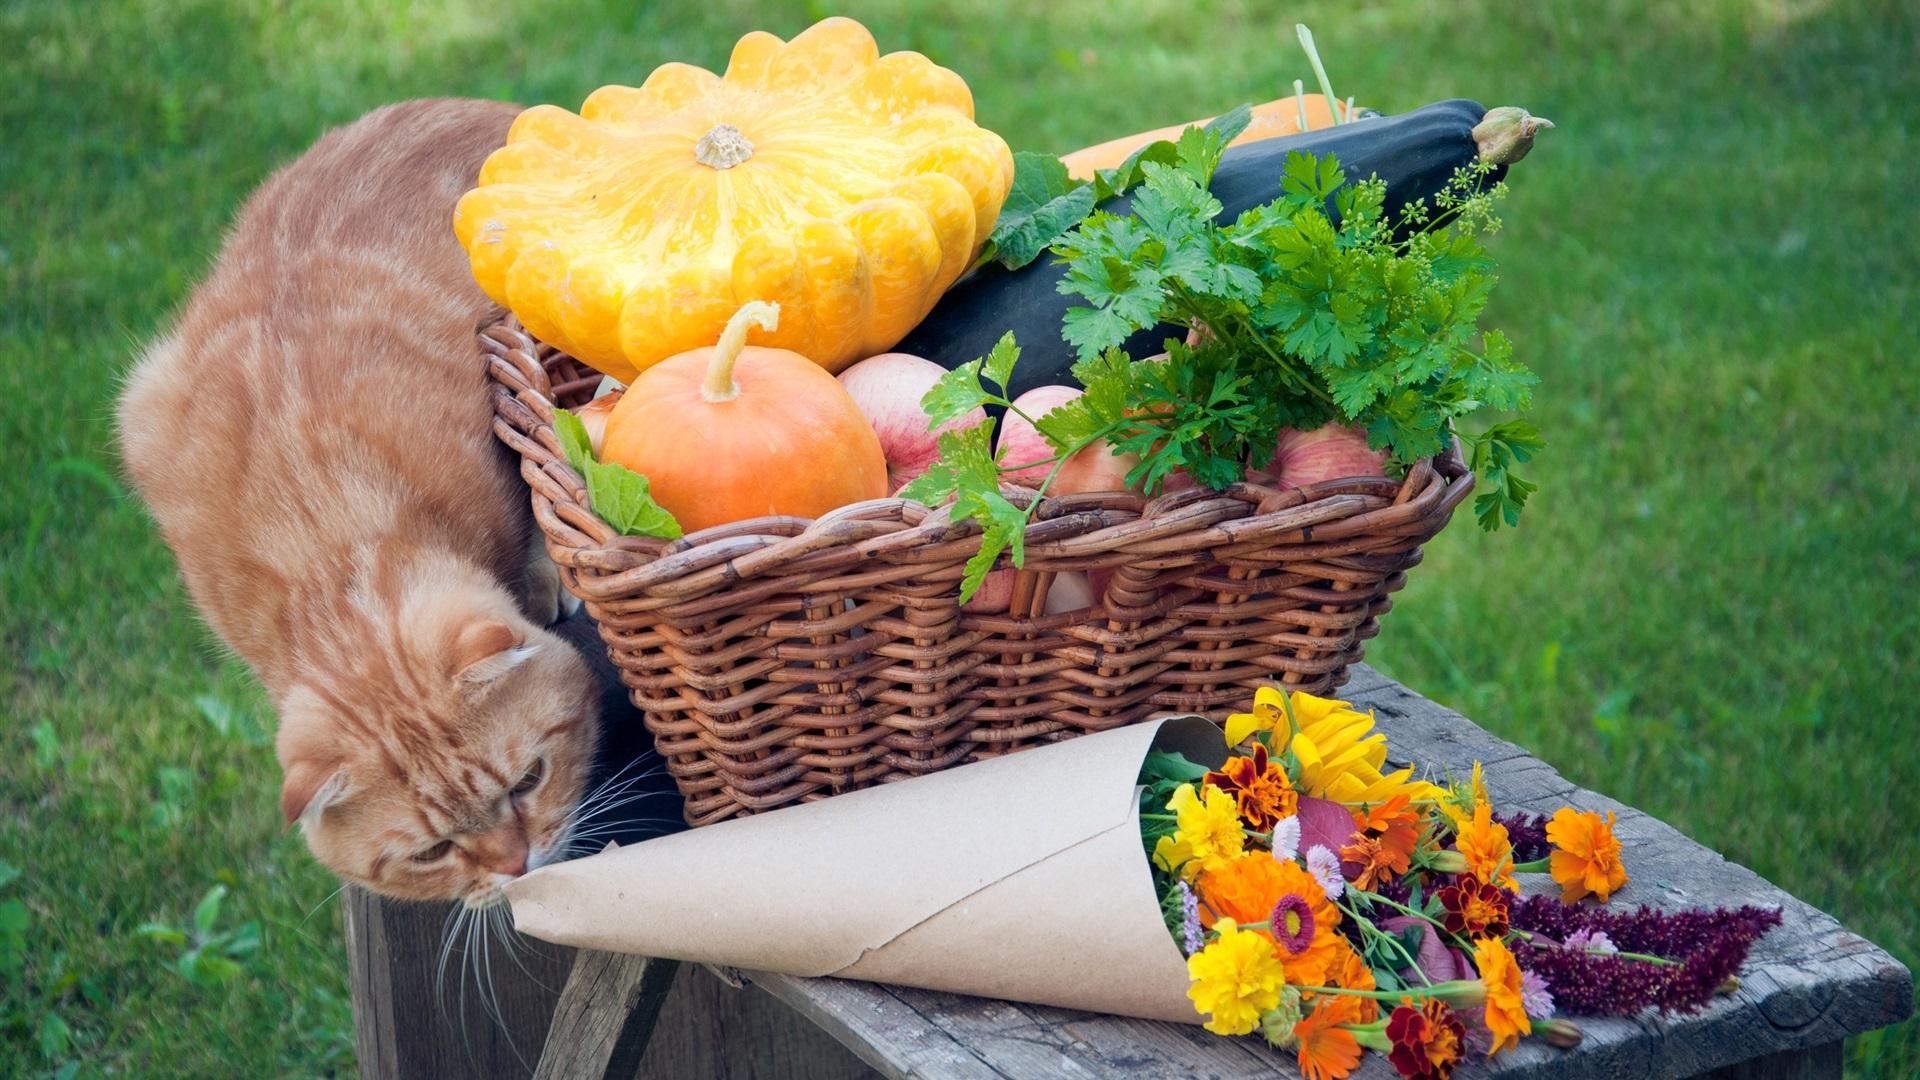 Download Wallpaper 1920x1080 Cat, Vegetables, Flowers